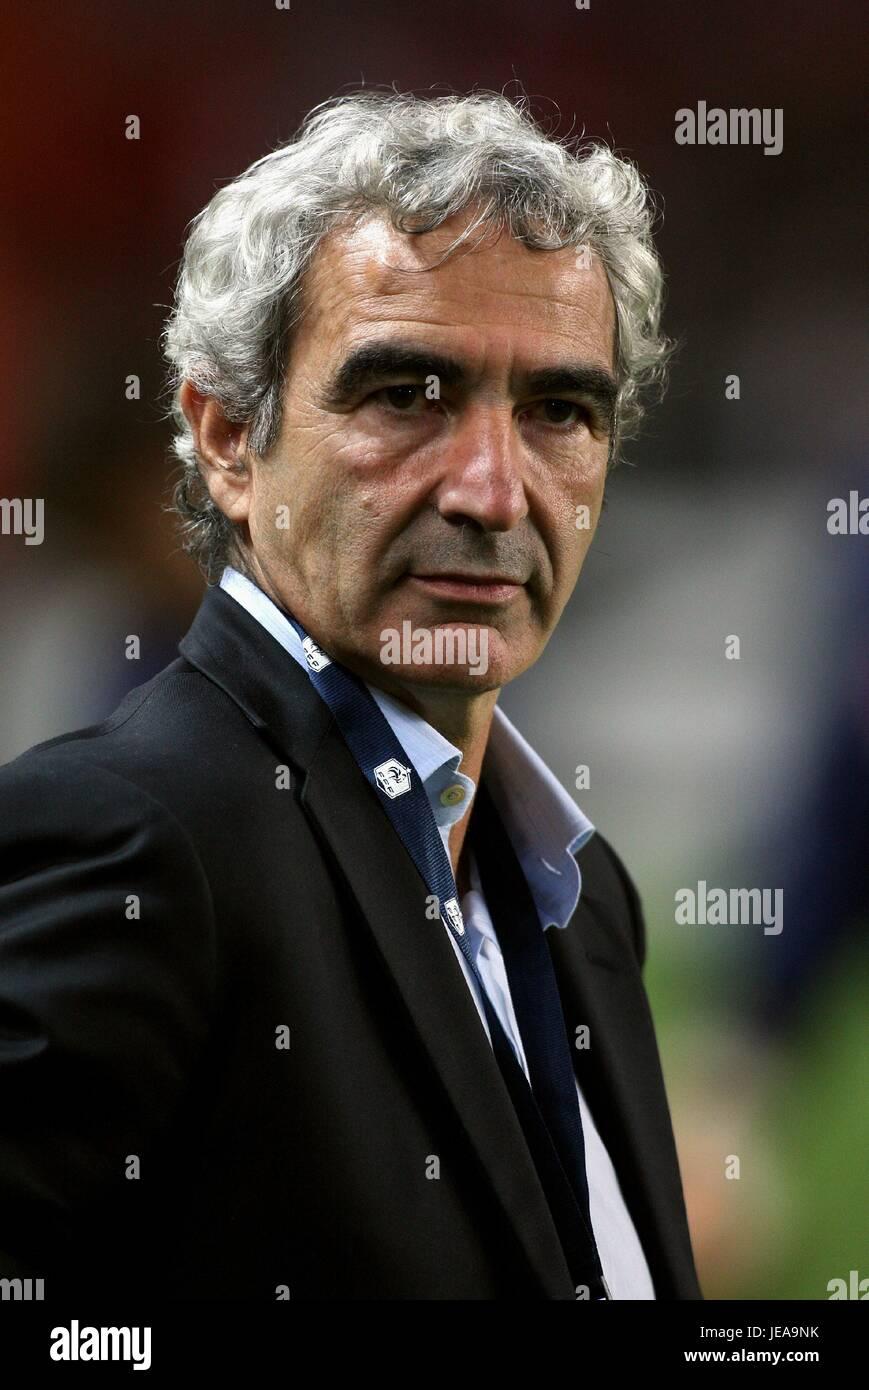 Raymond Domenech France Football Coach Parc Des Princes Paris France Stock Photo Alamy